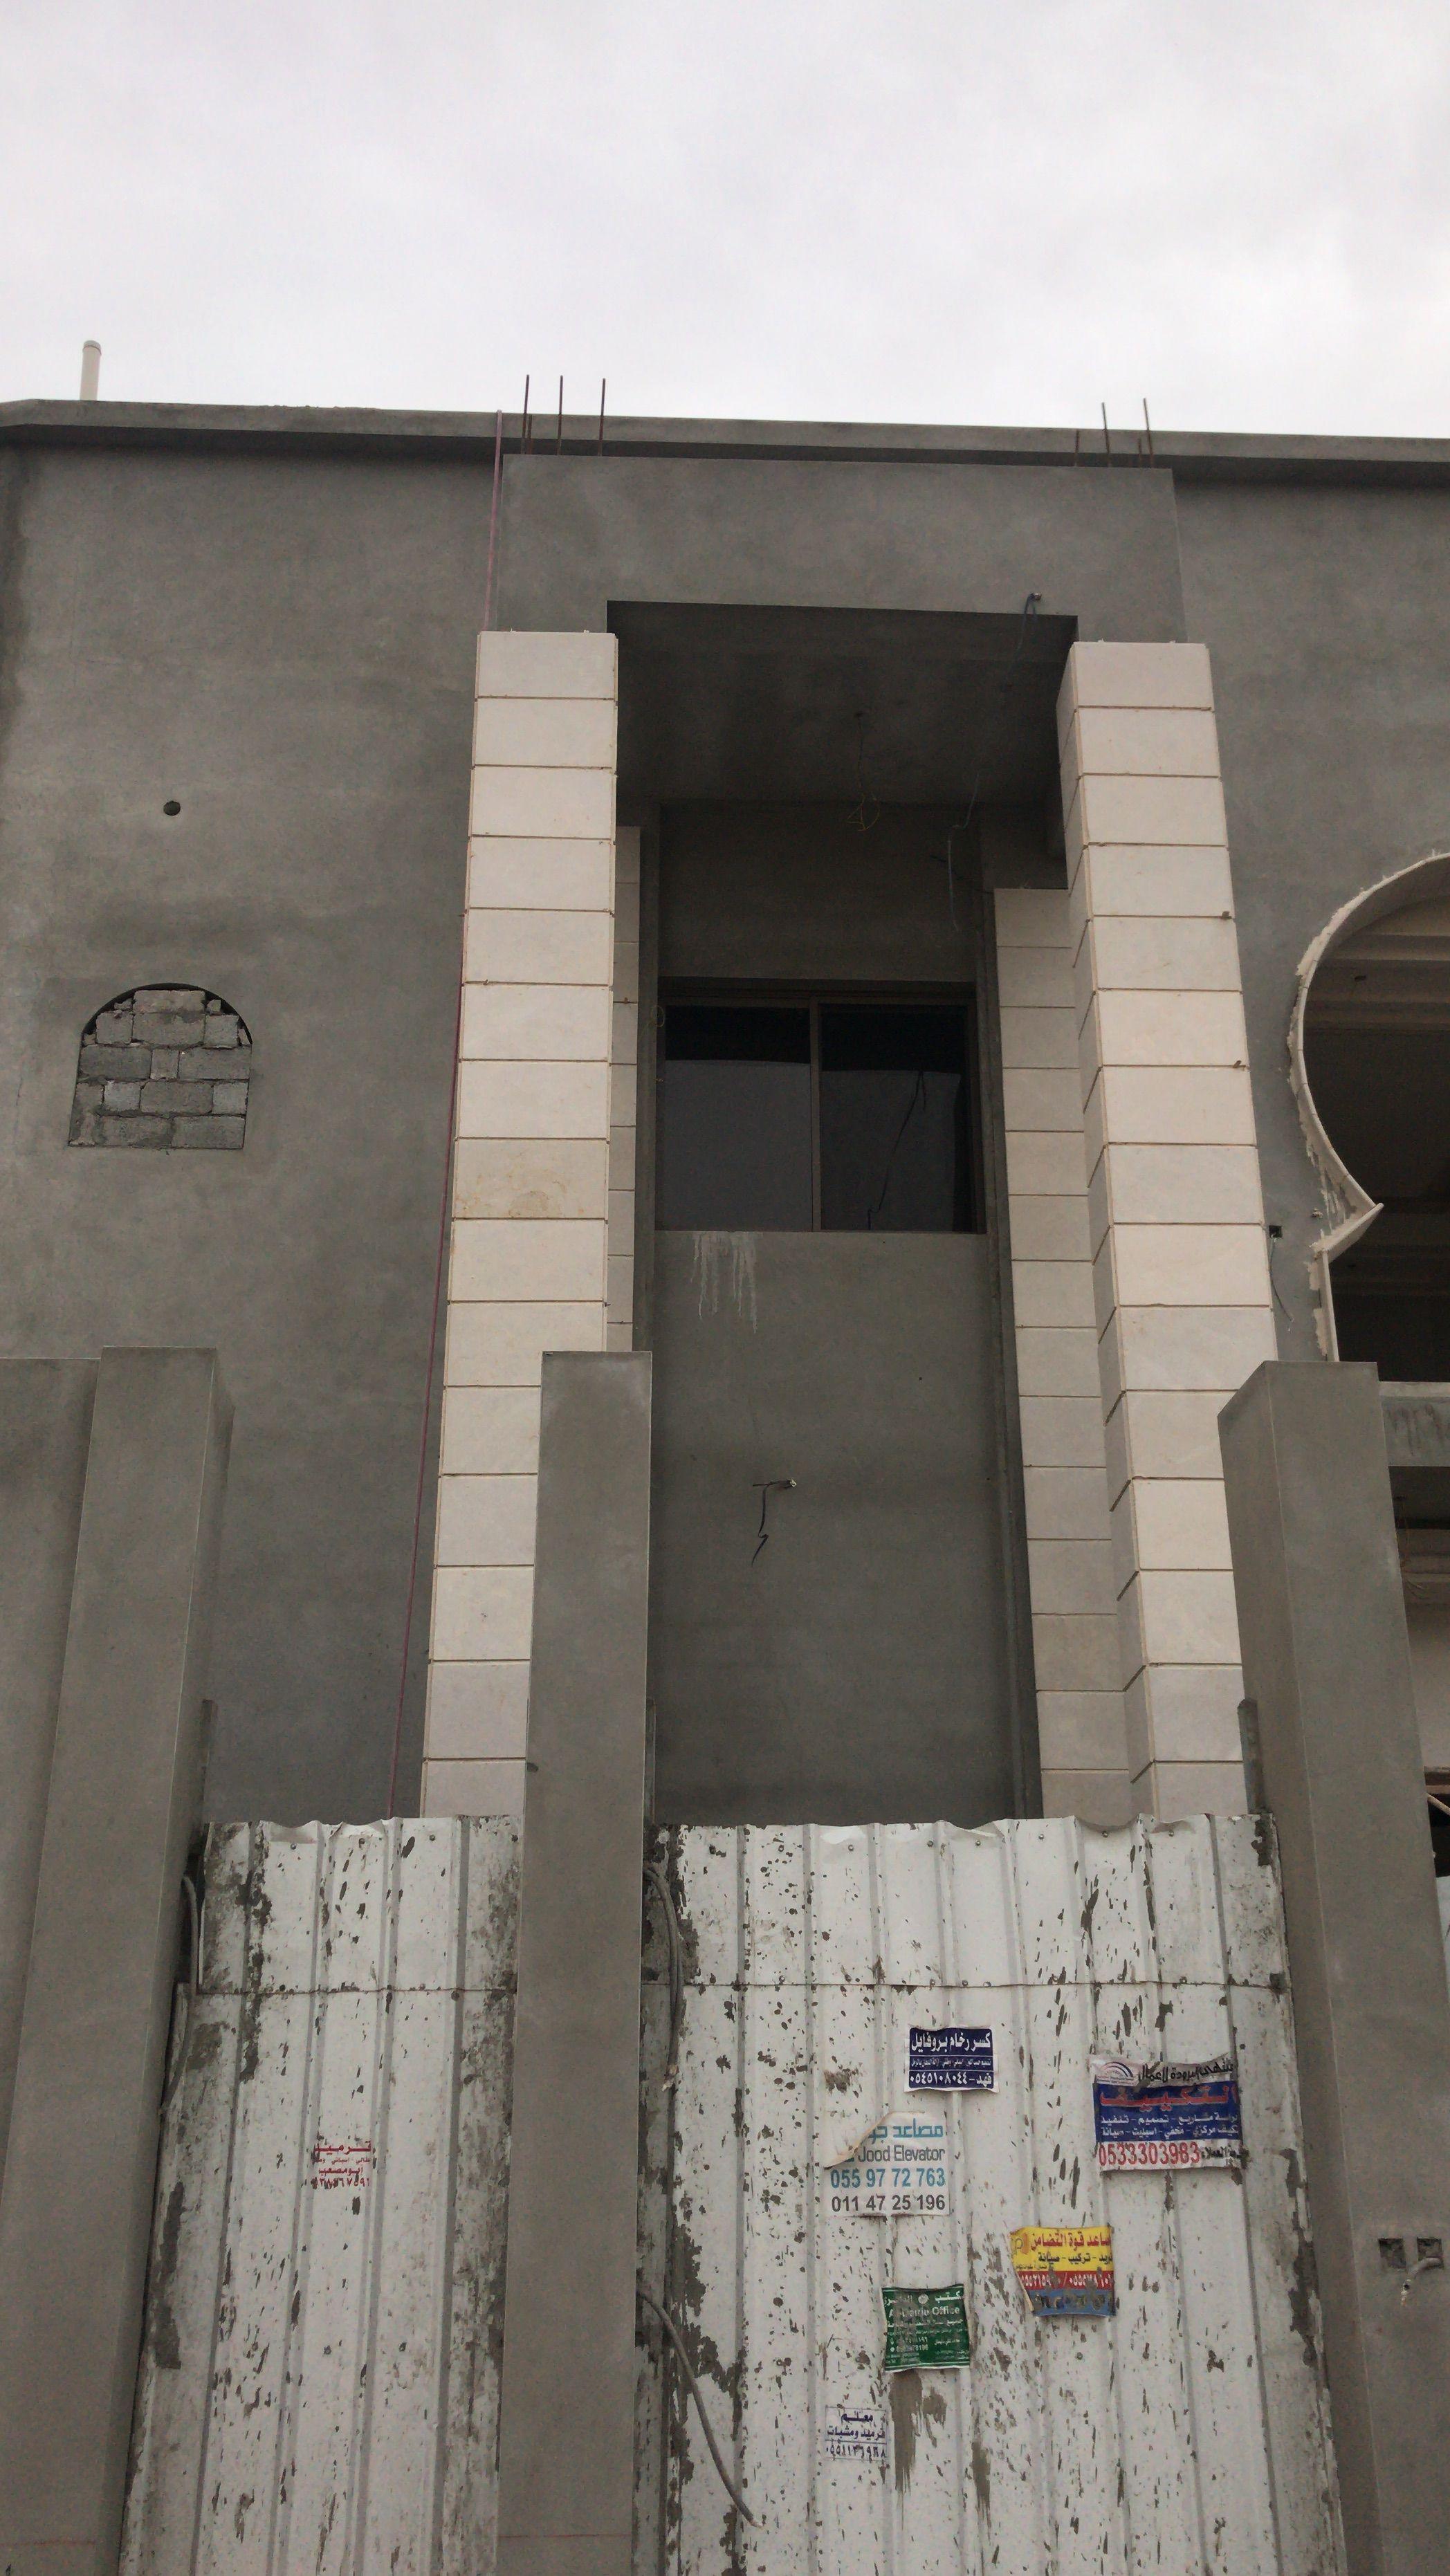 Pin By Ibrahim On واجهات Outdoor Decor Garage Doors Decor